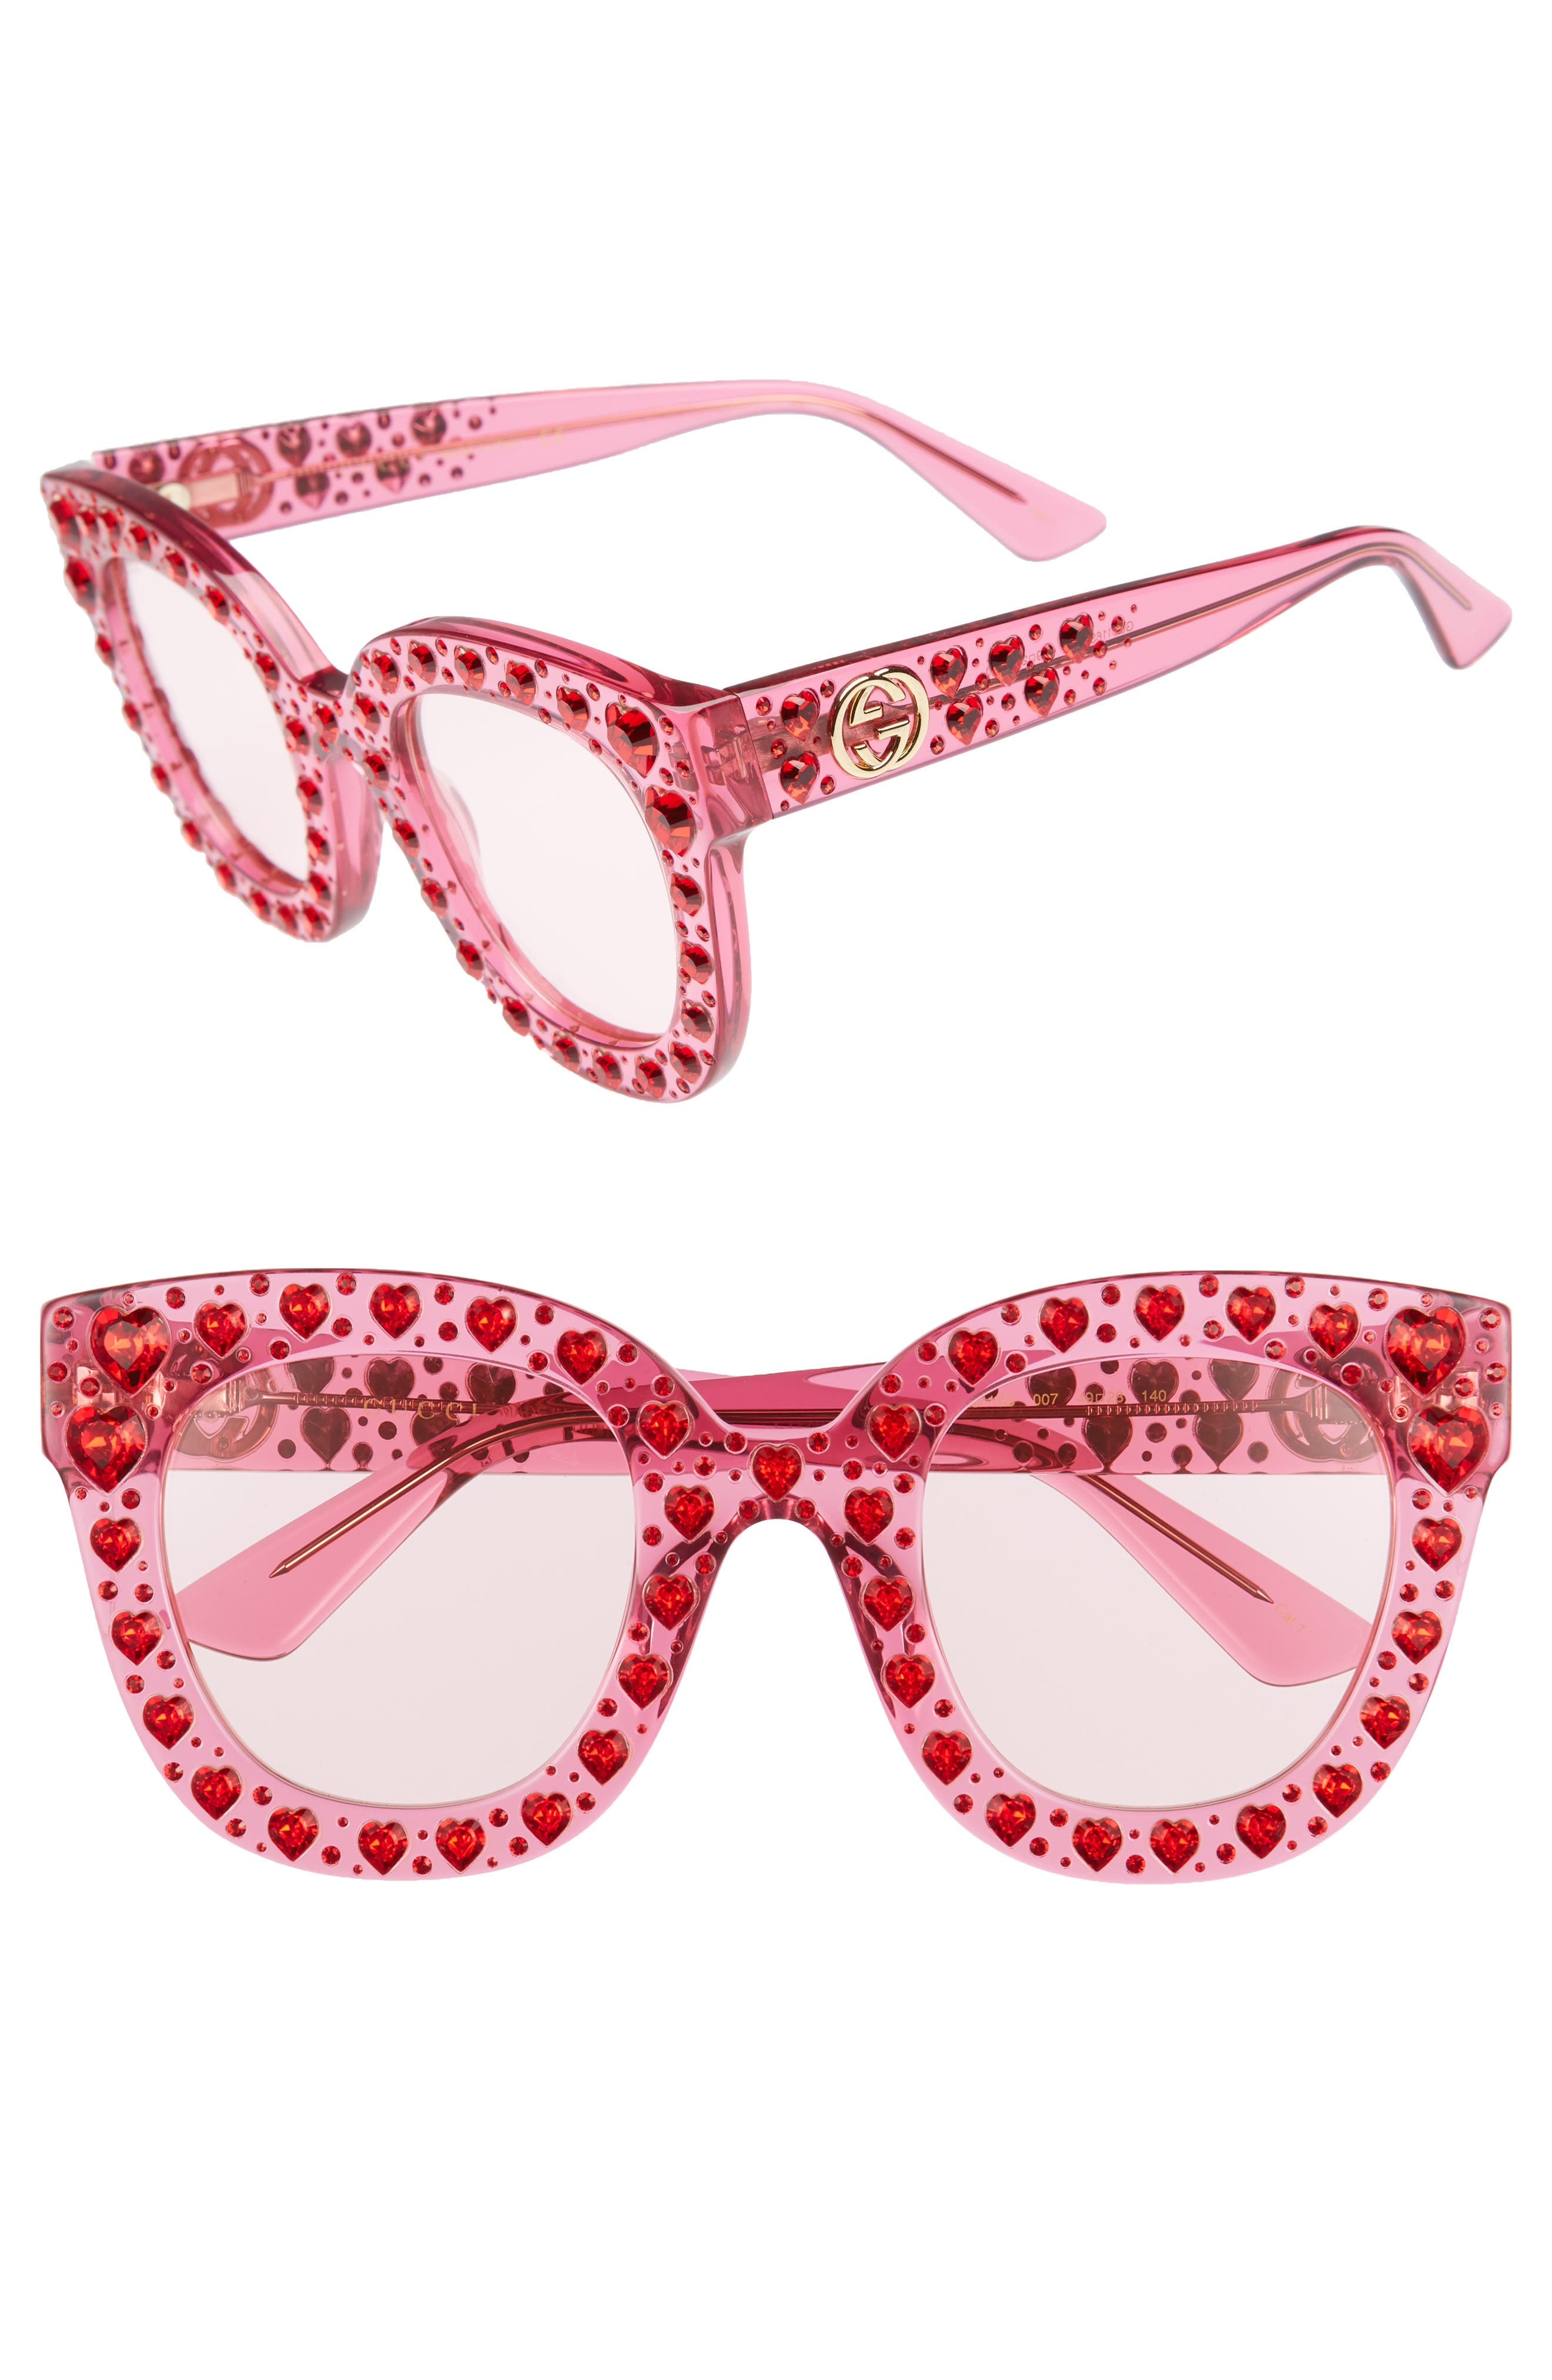 49mm Crystal Heart Sunglasses,                             Main thumbnail 1, color,                             FUCHSIA